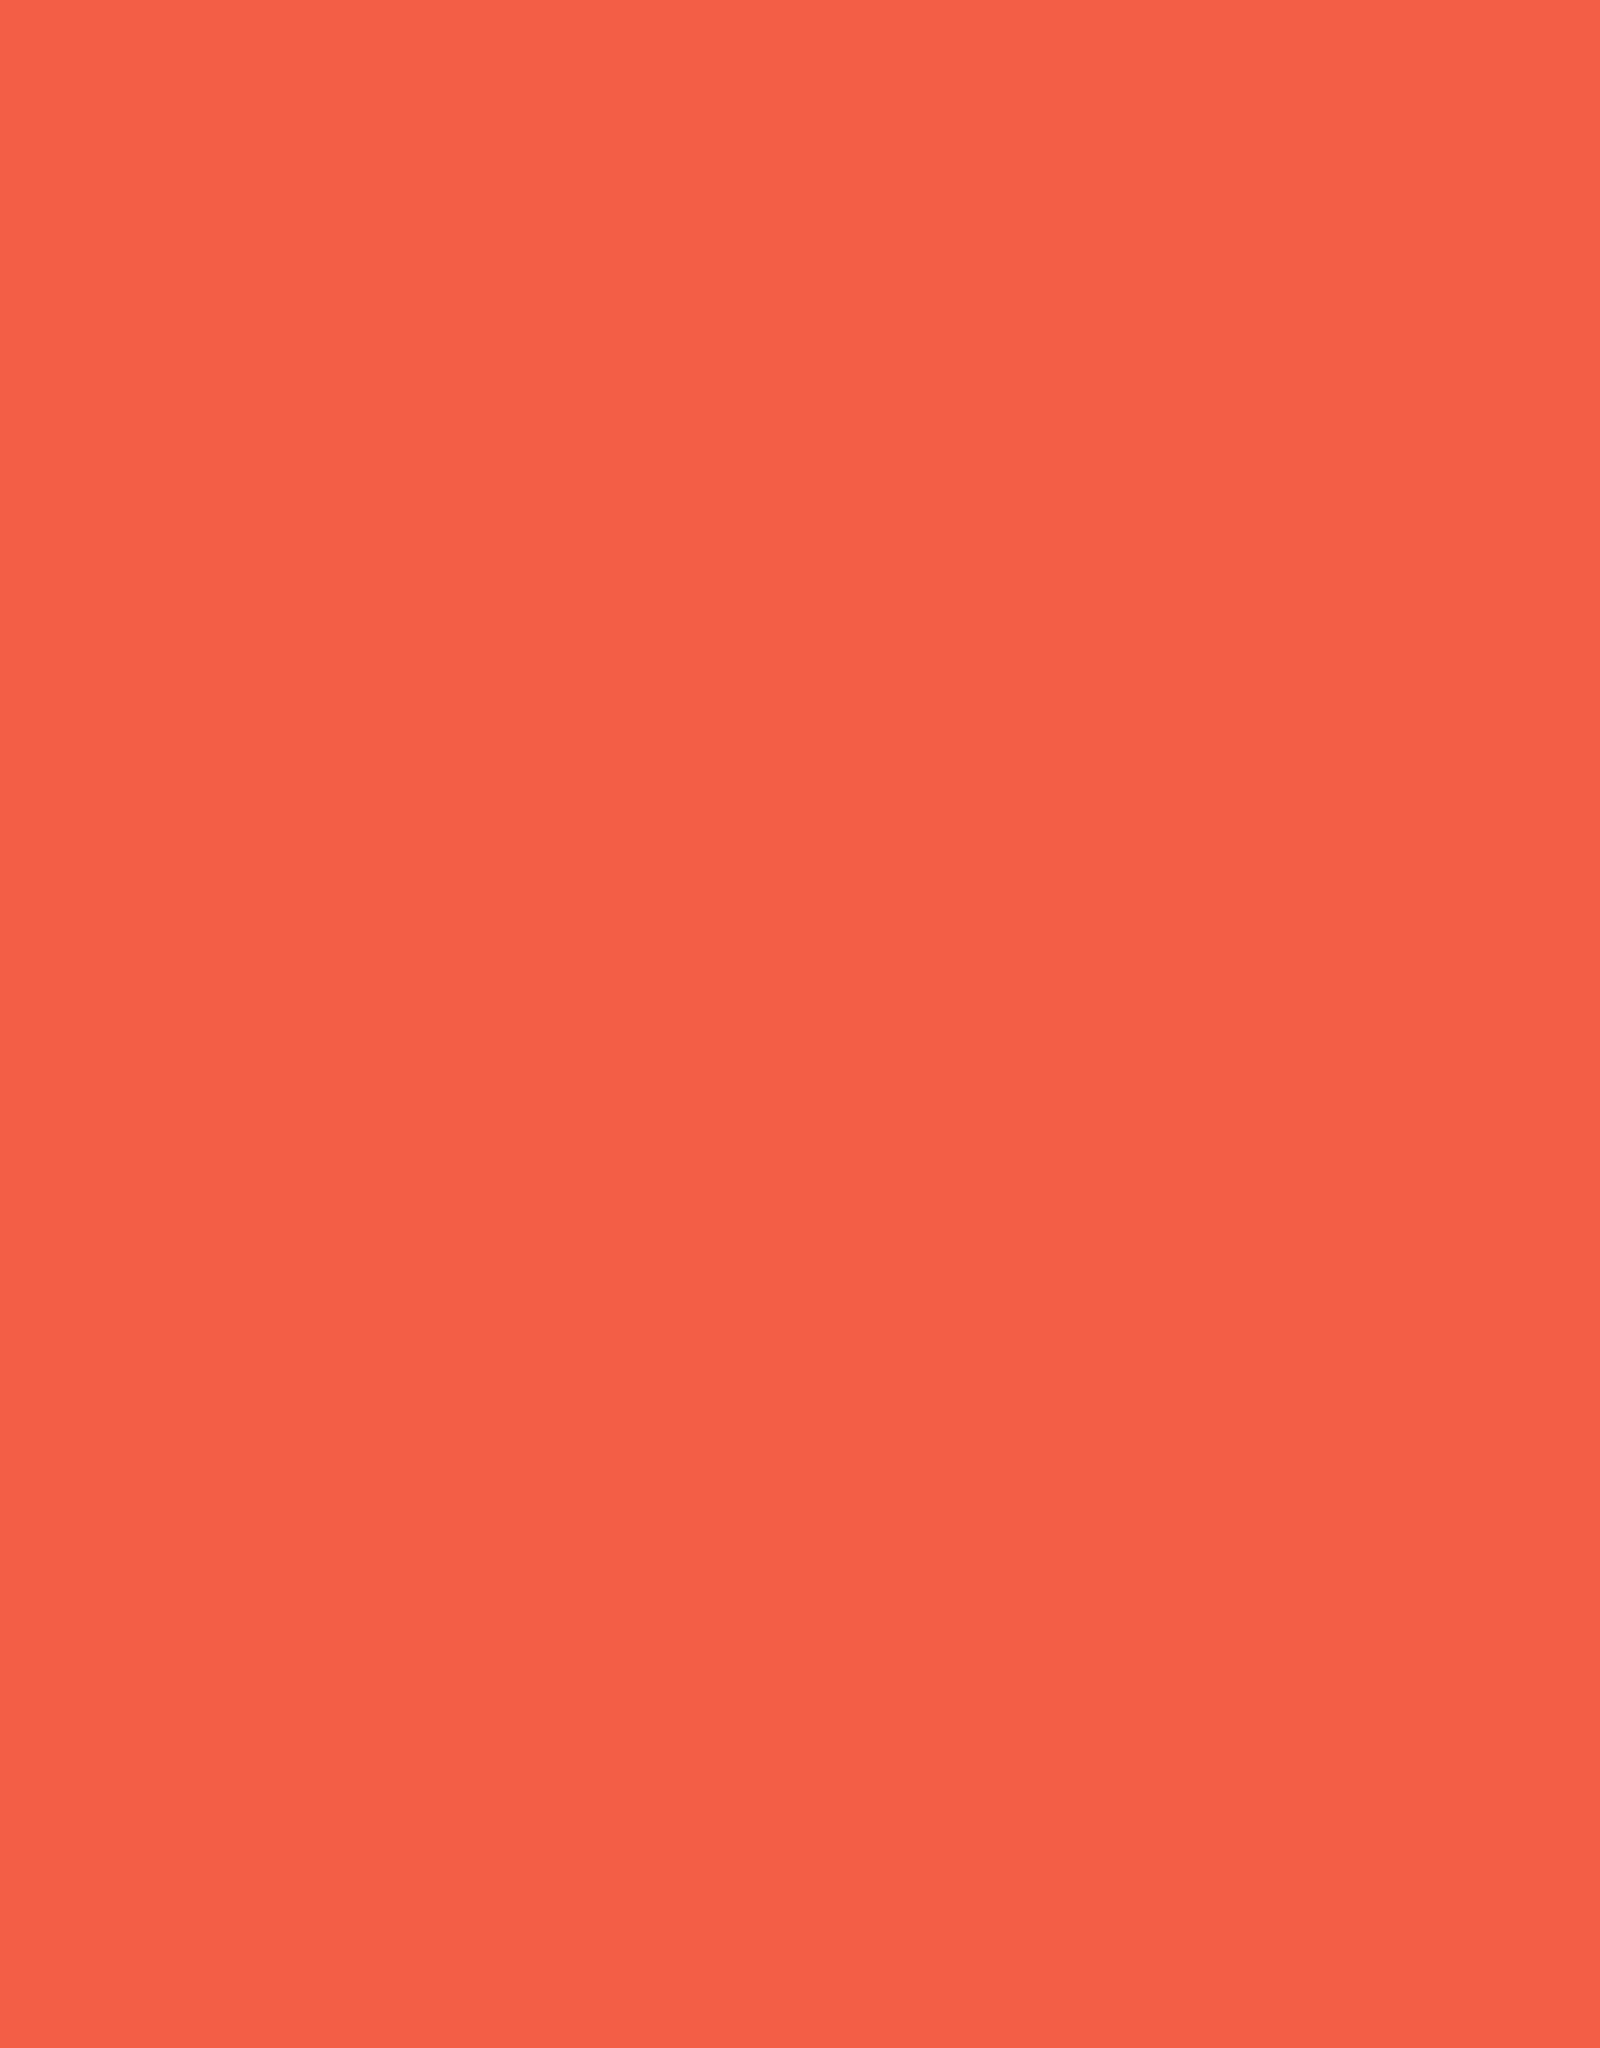 Superior Seamless Superior Seamless 9' Bright Orange #39